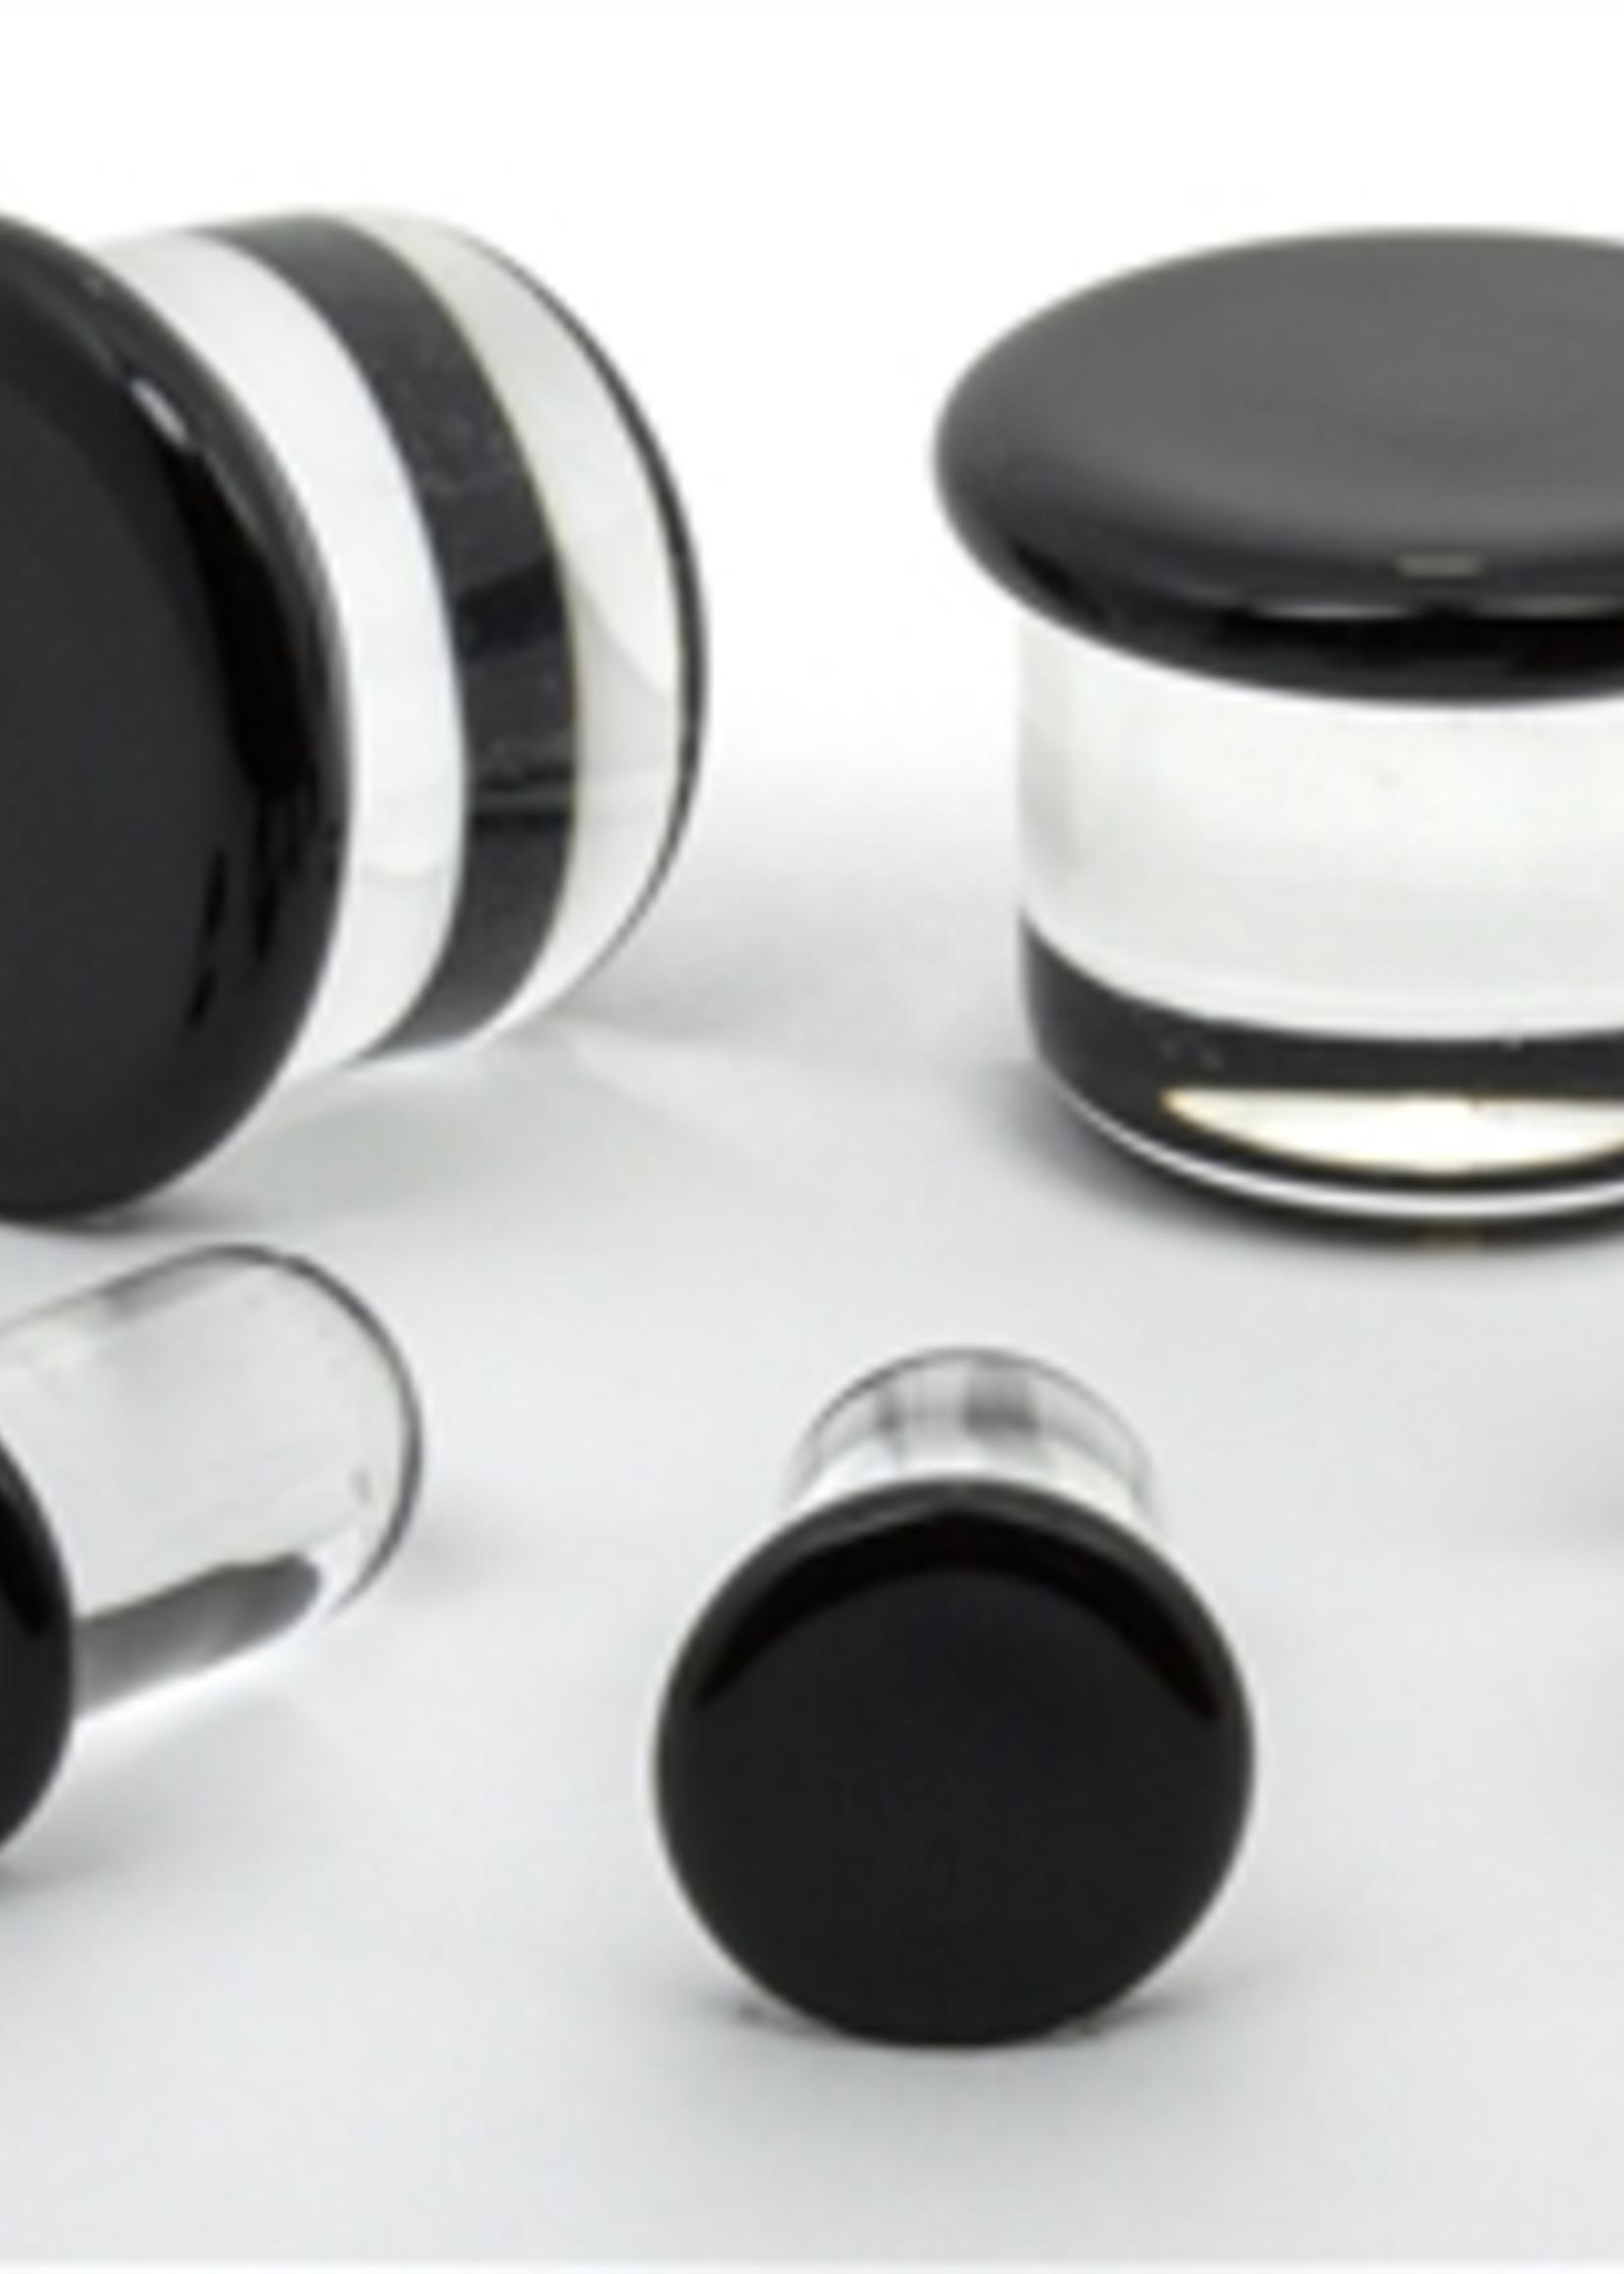 23mm SF Glass Plugs